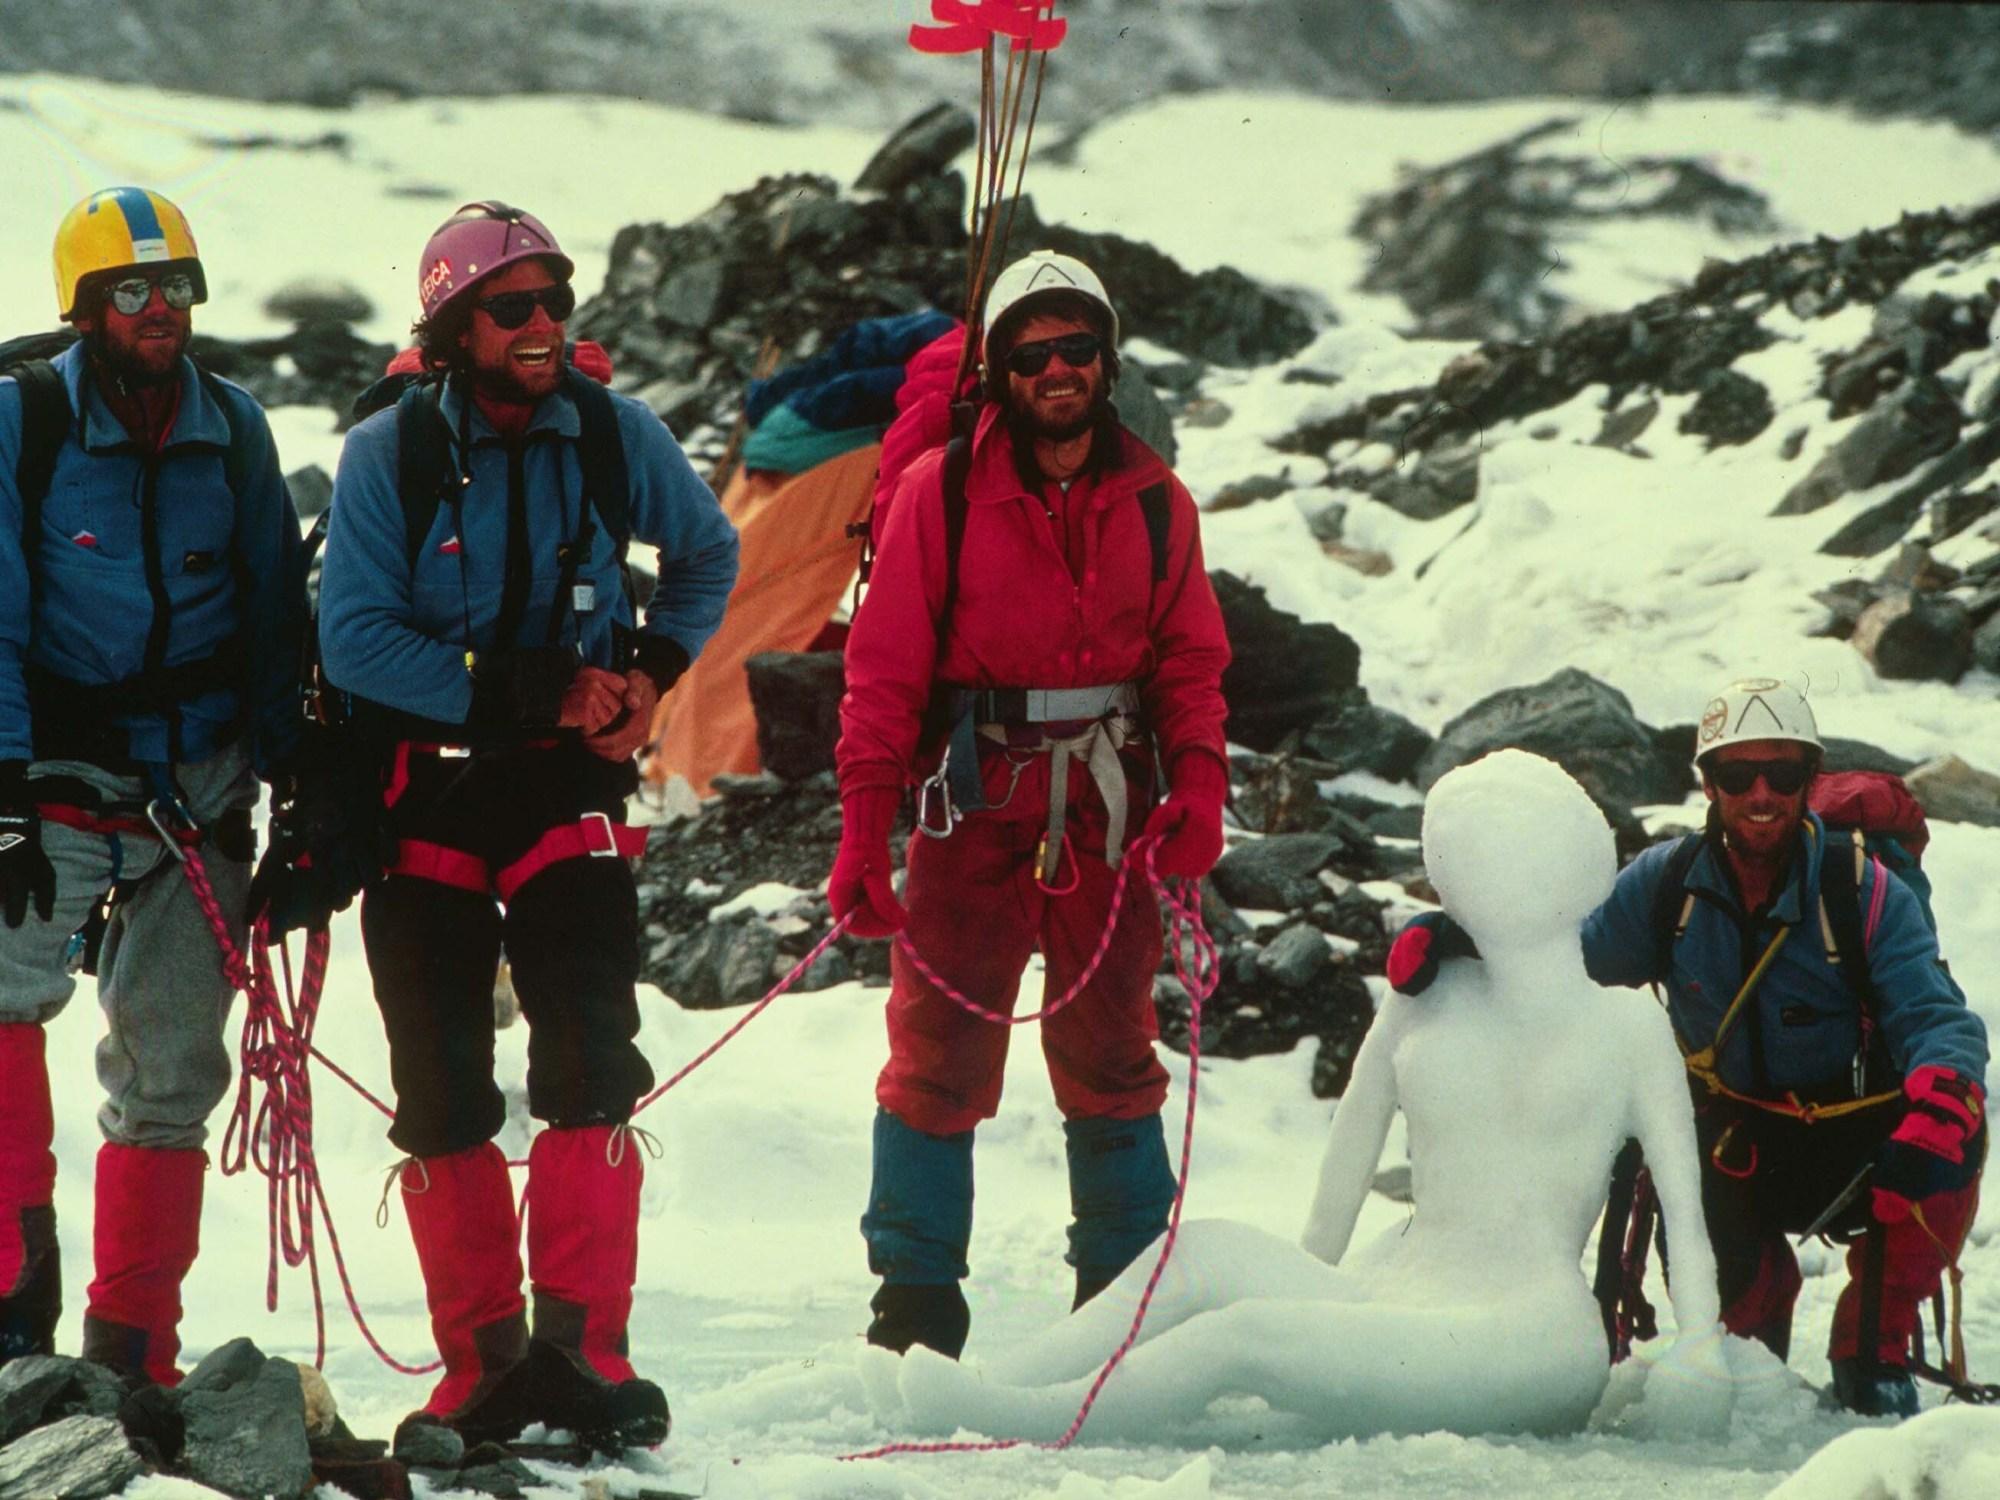 Kangshung Face, Everest, Stephen Venables, Robert Mads Anderson, Ed Webster, Paul Teare